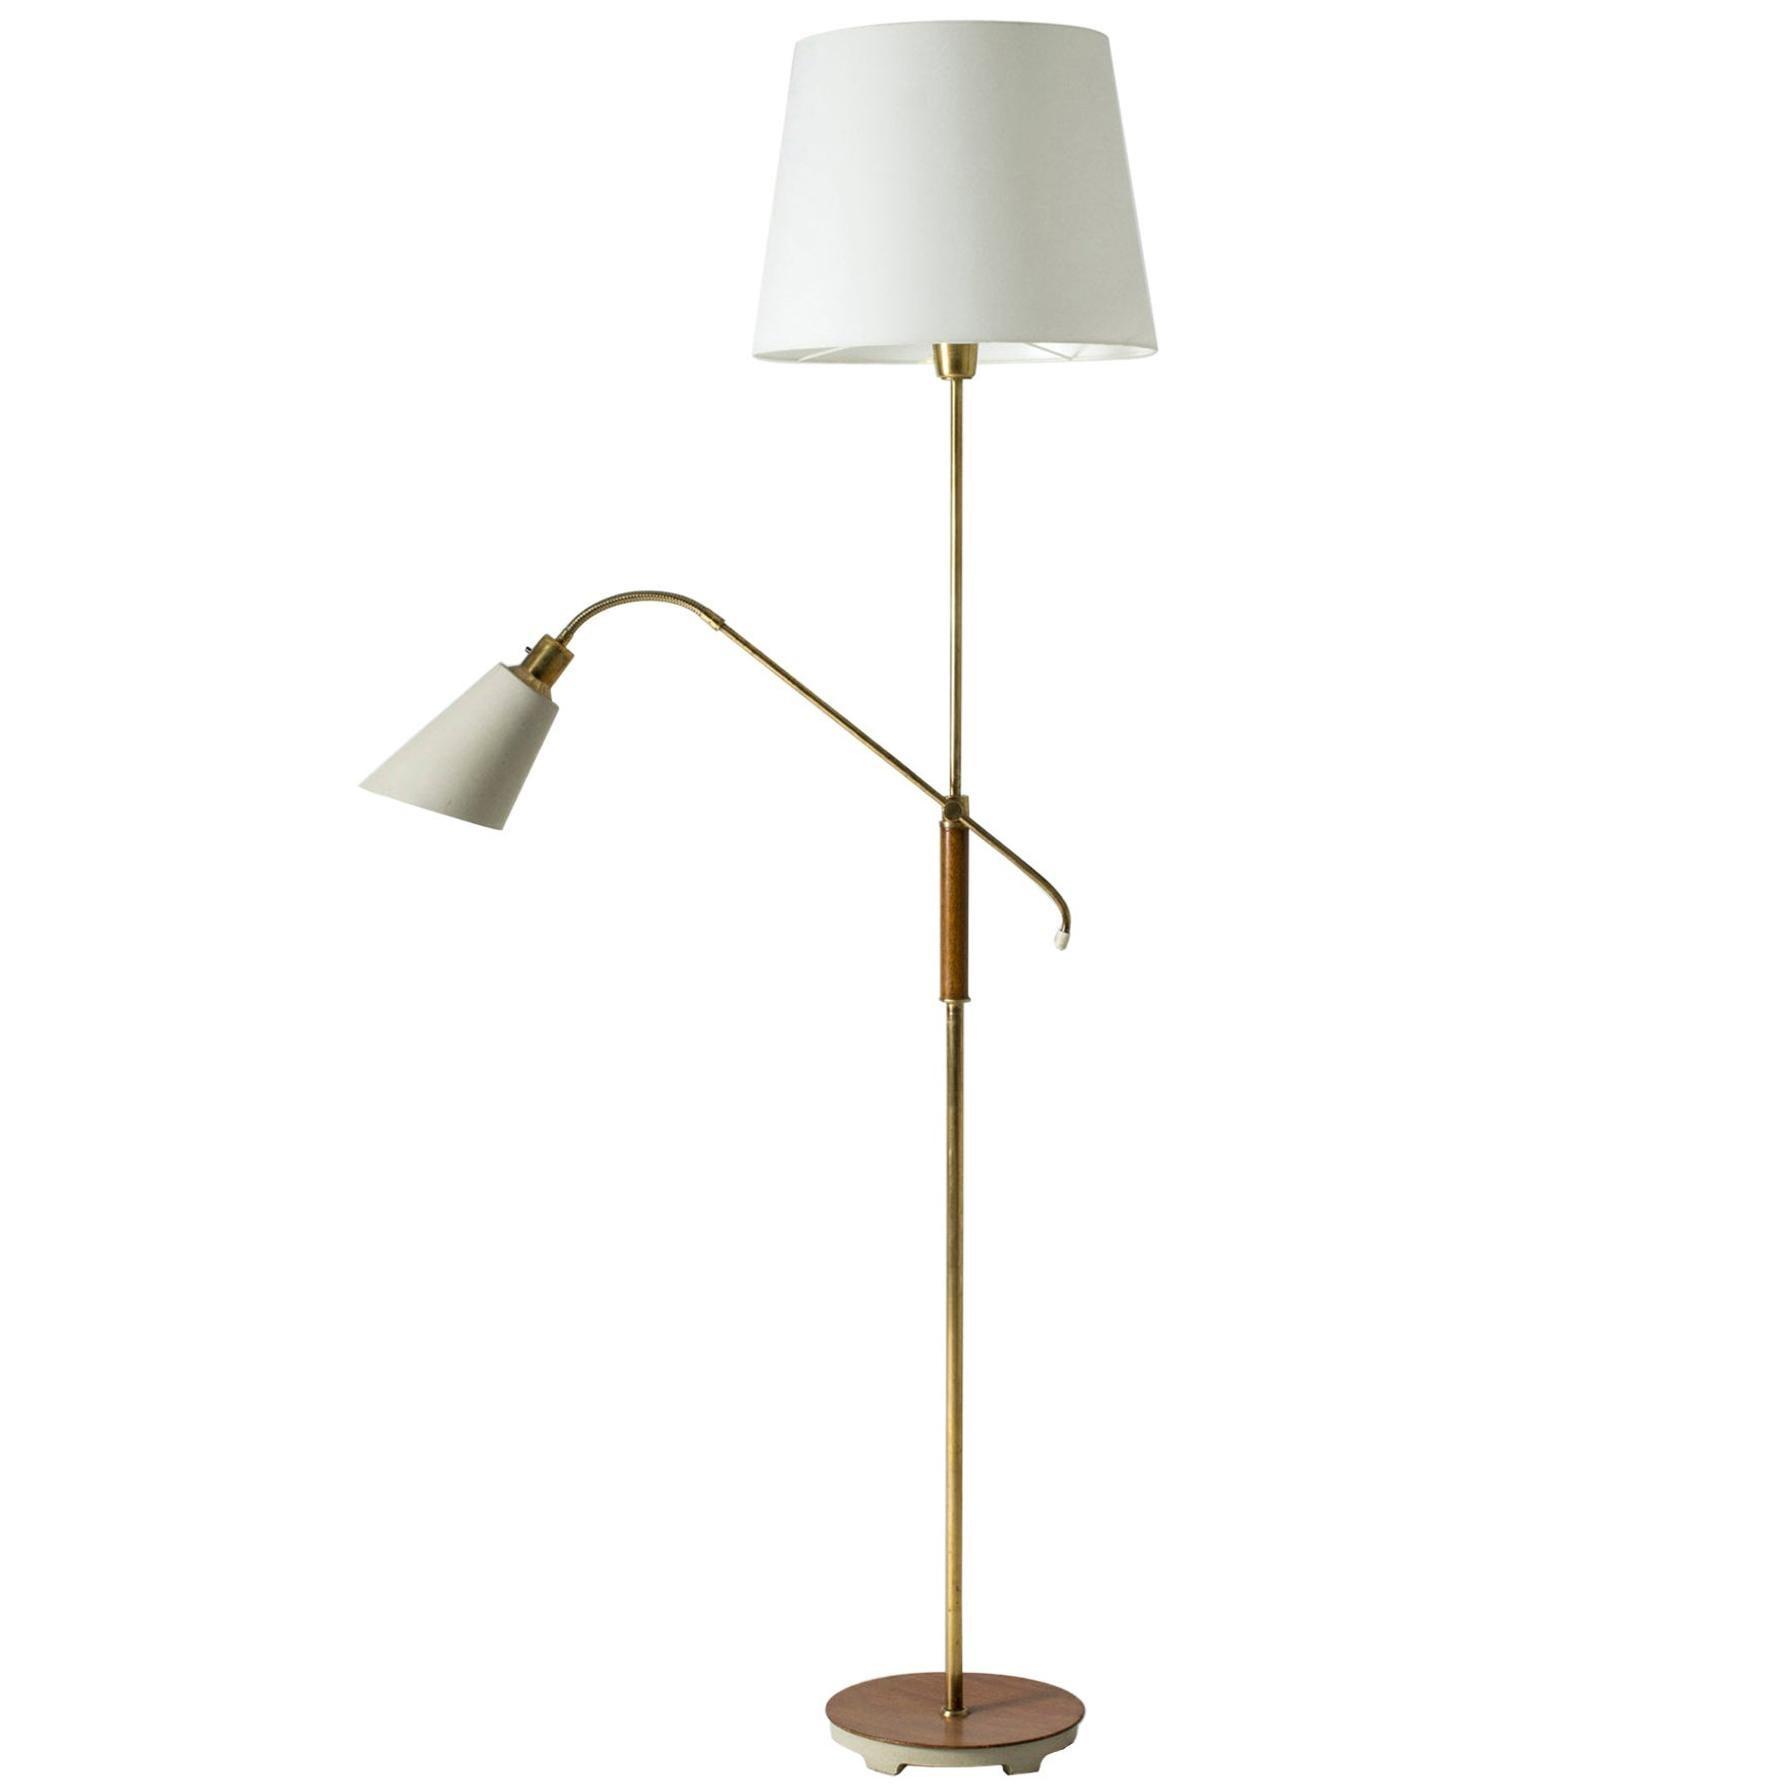 Brass and Wood Swedish Floor Lamp by Bertil Brisborg for Nordiska Kompaniet